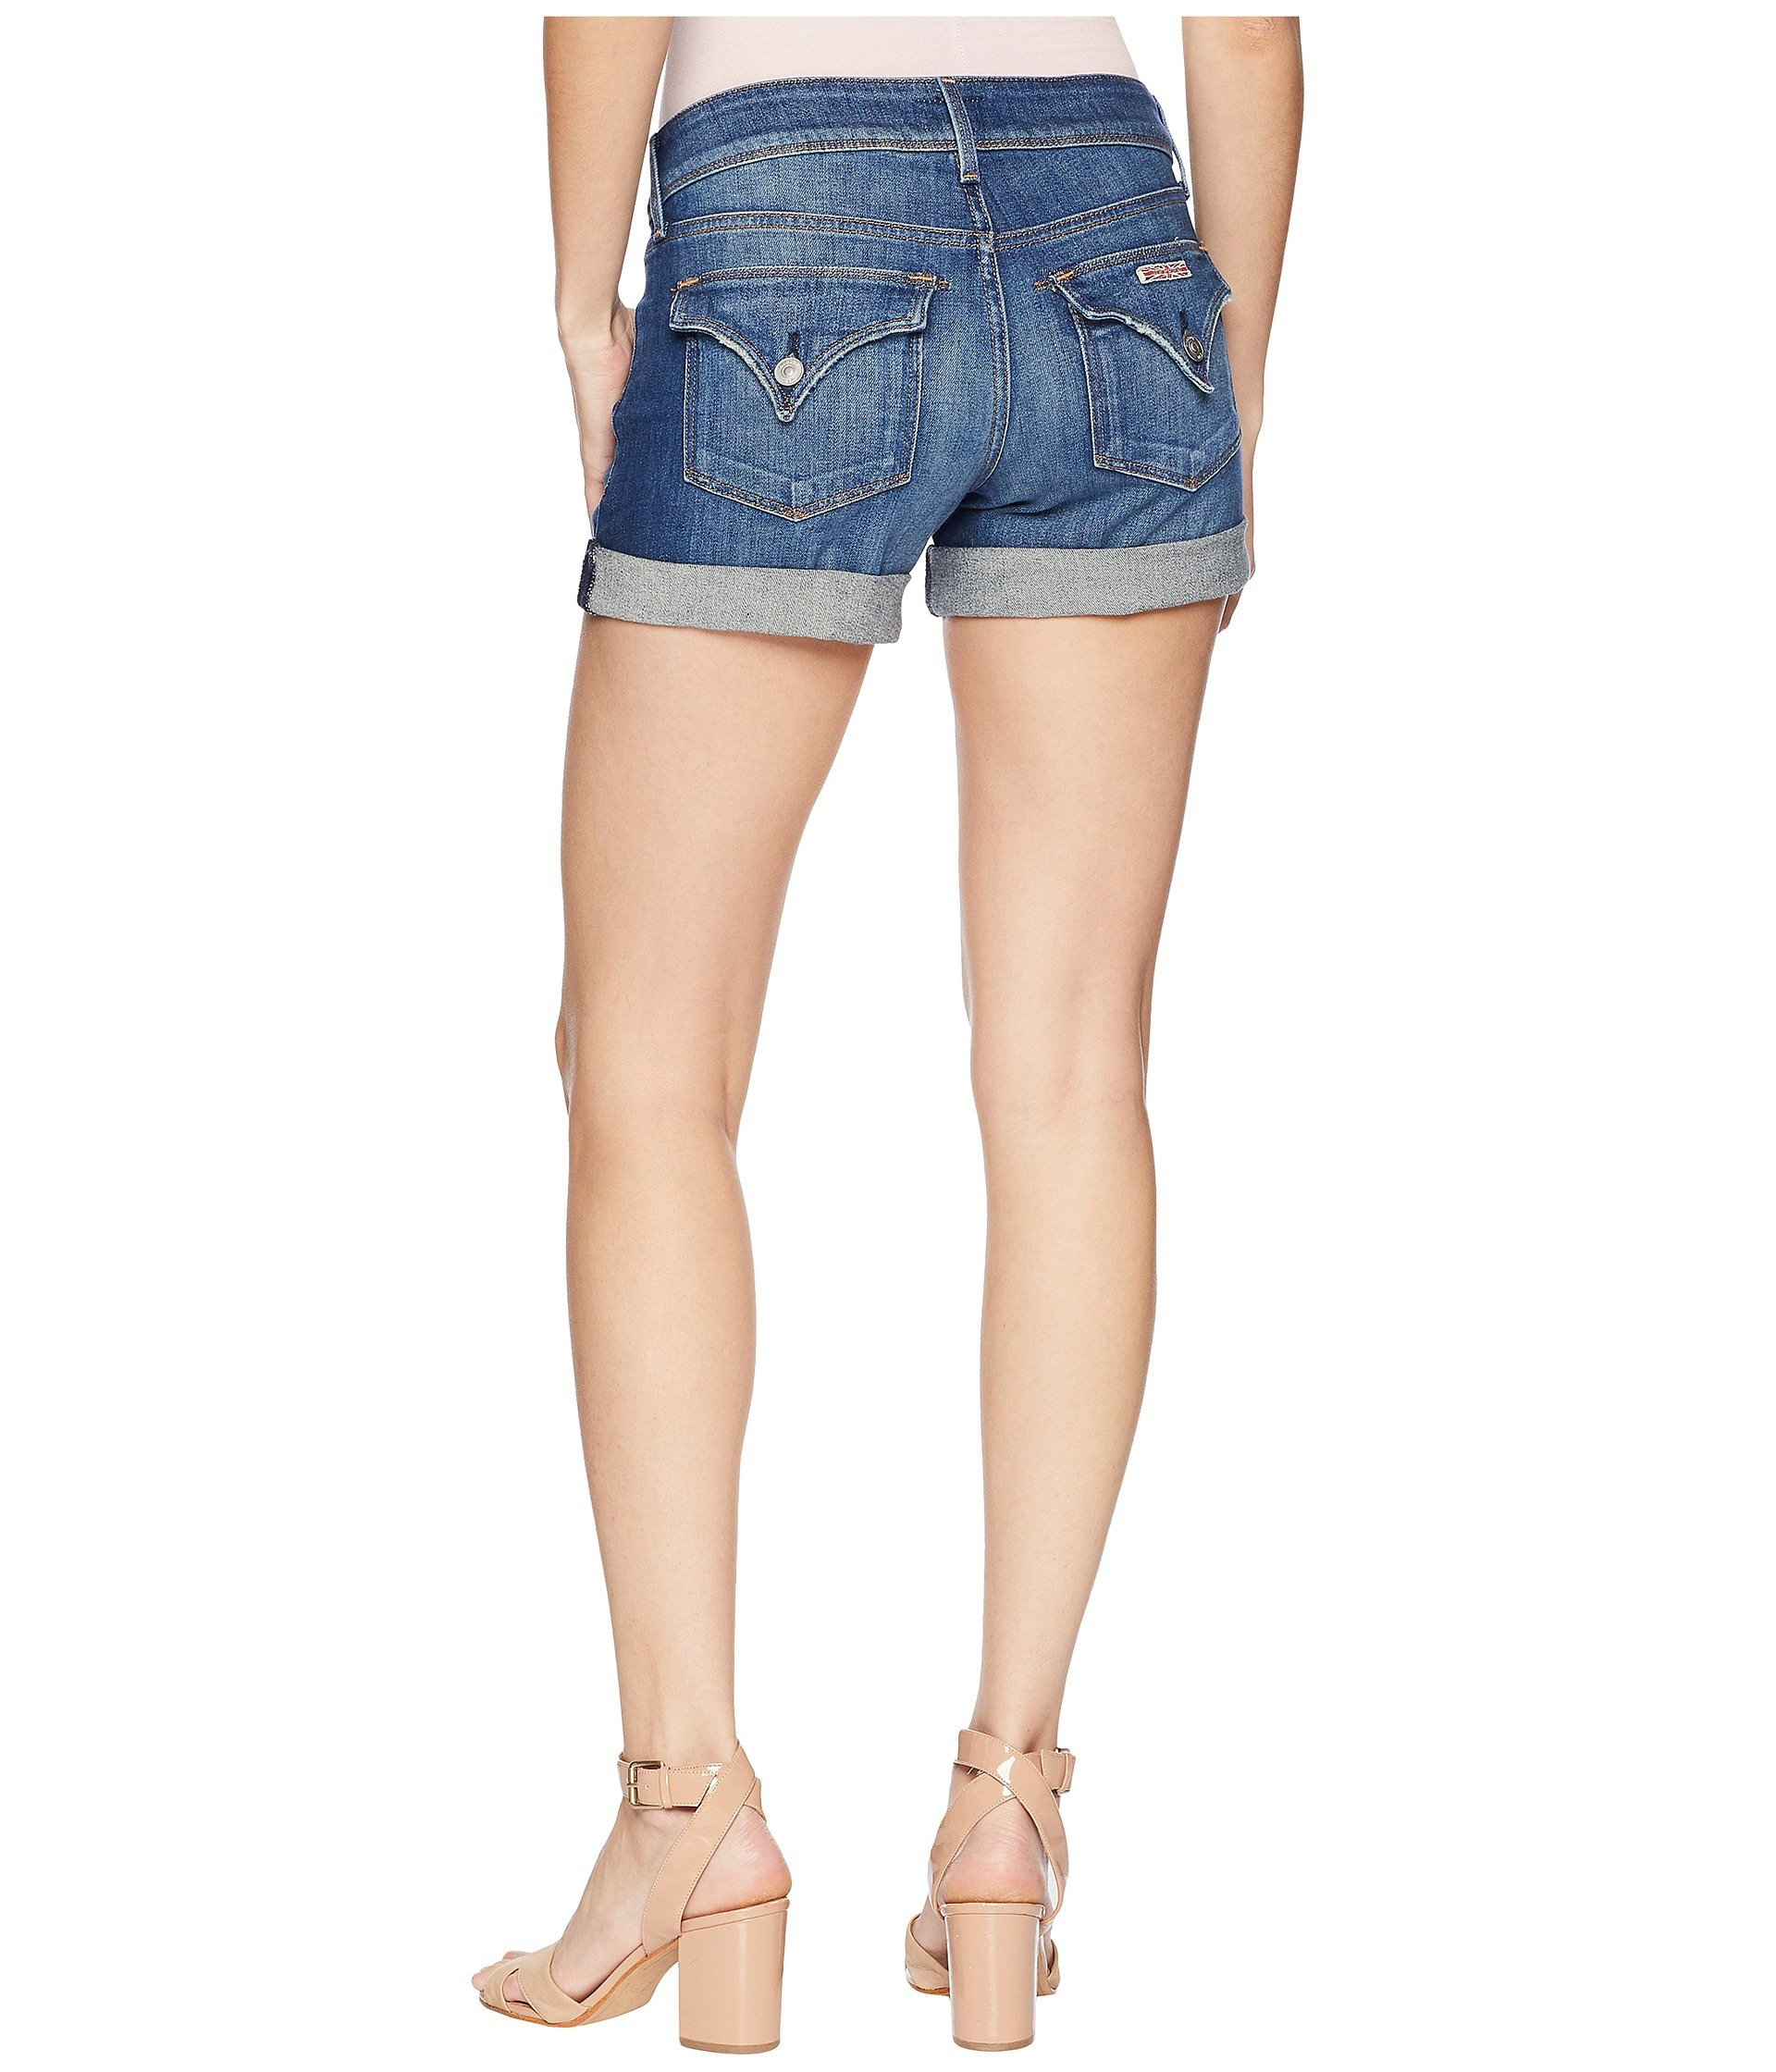 Croxley Shorts Mid In Ramona Thigh Hudson gqvSxZ8